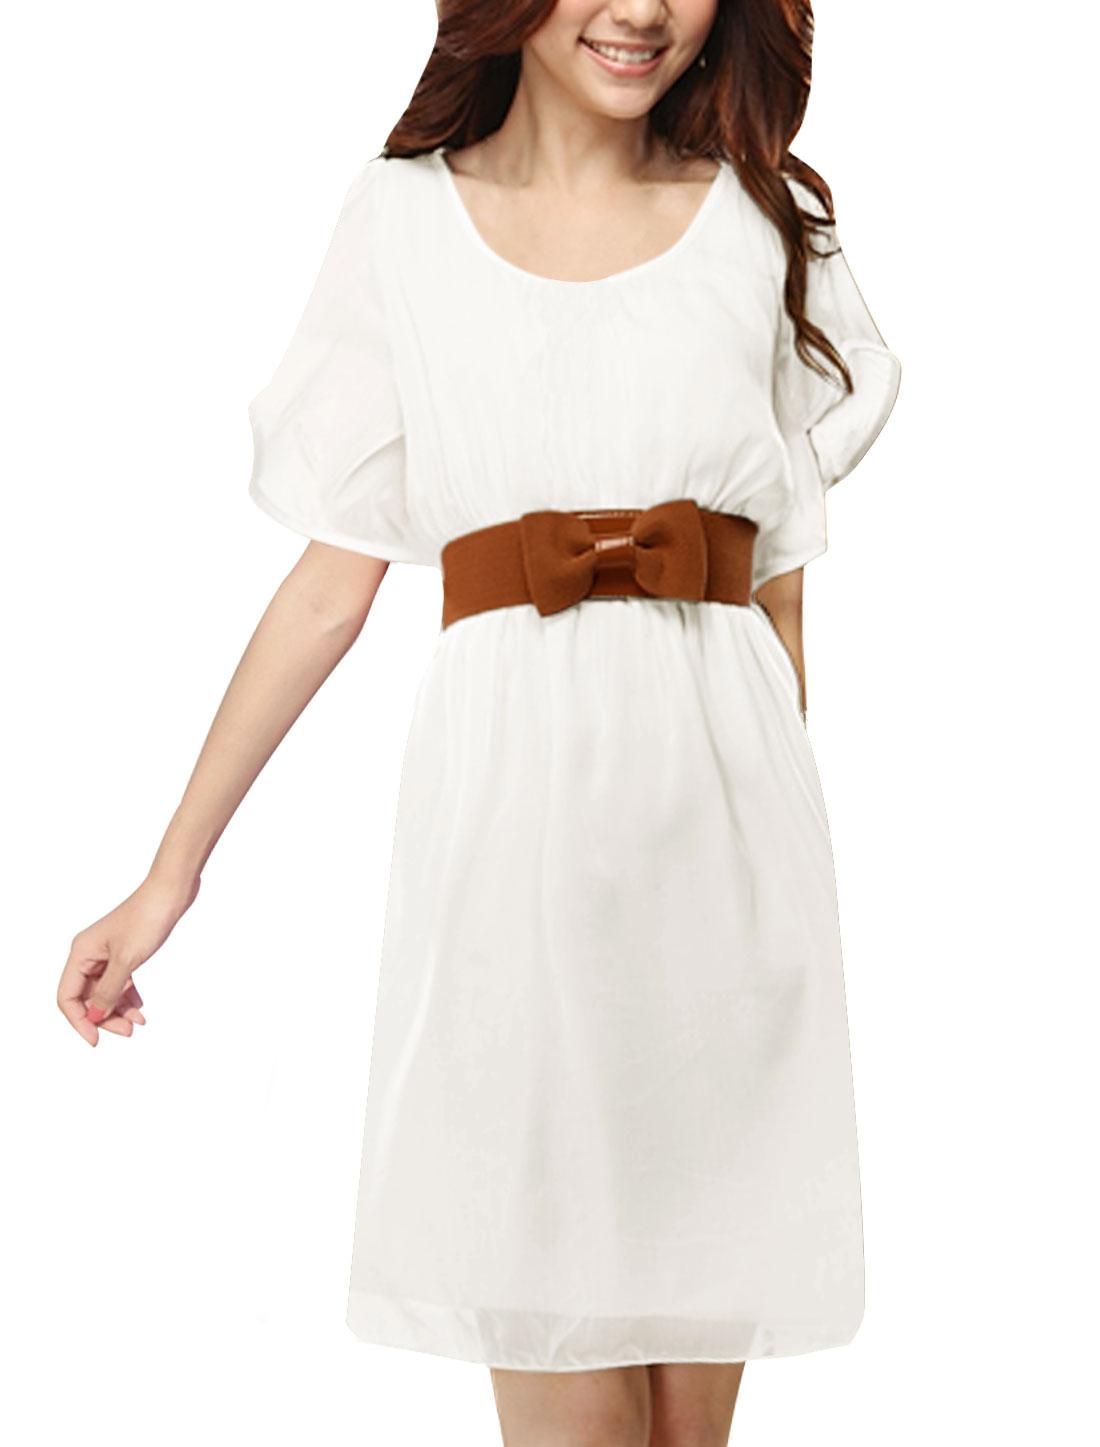 Woman Fashion Ruffled Sleeve Design White Elegant Dress w Belt M